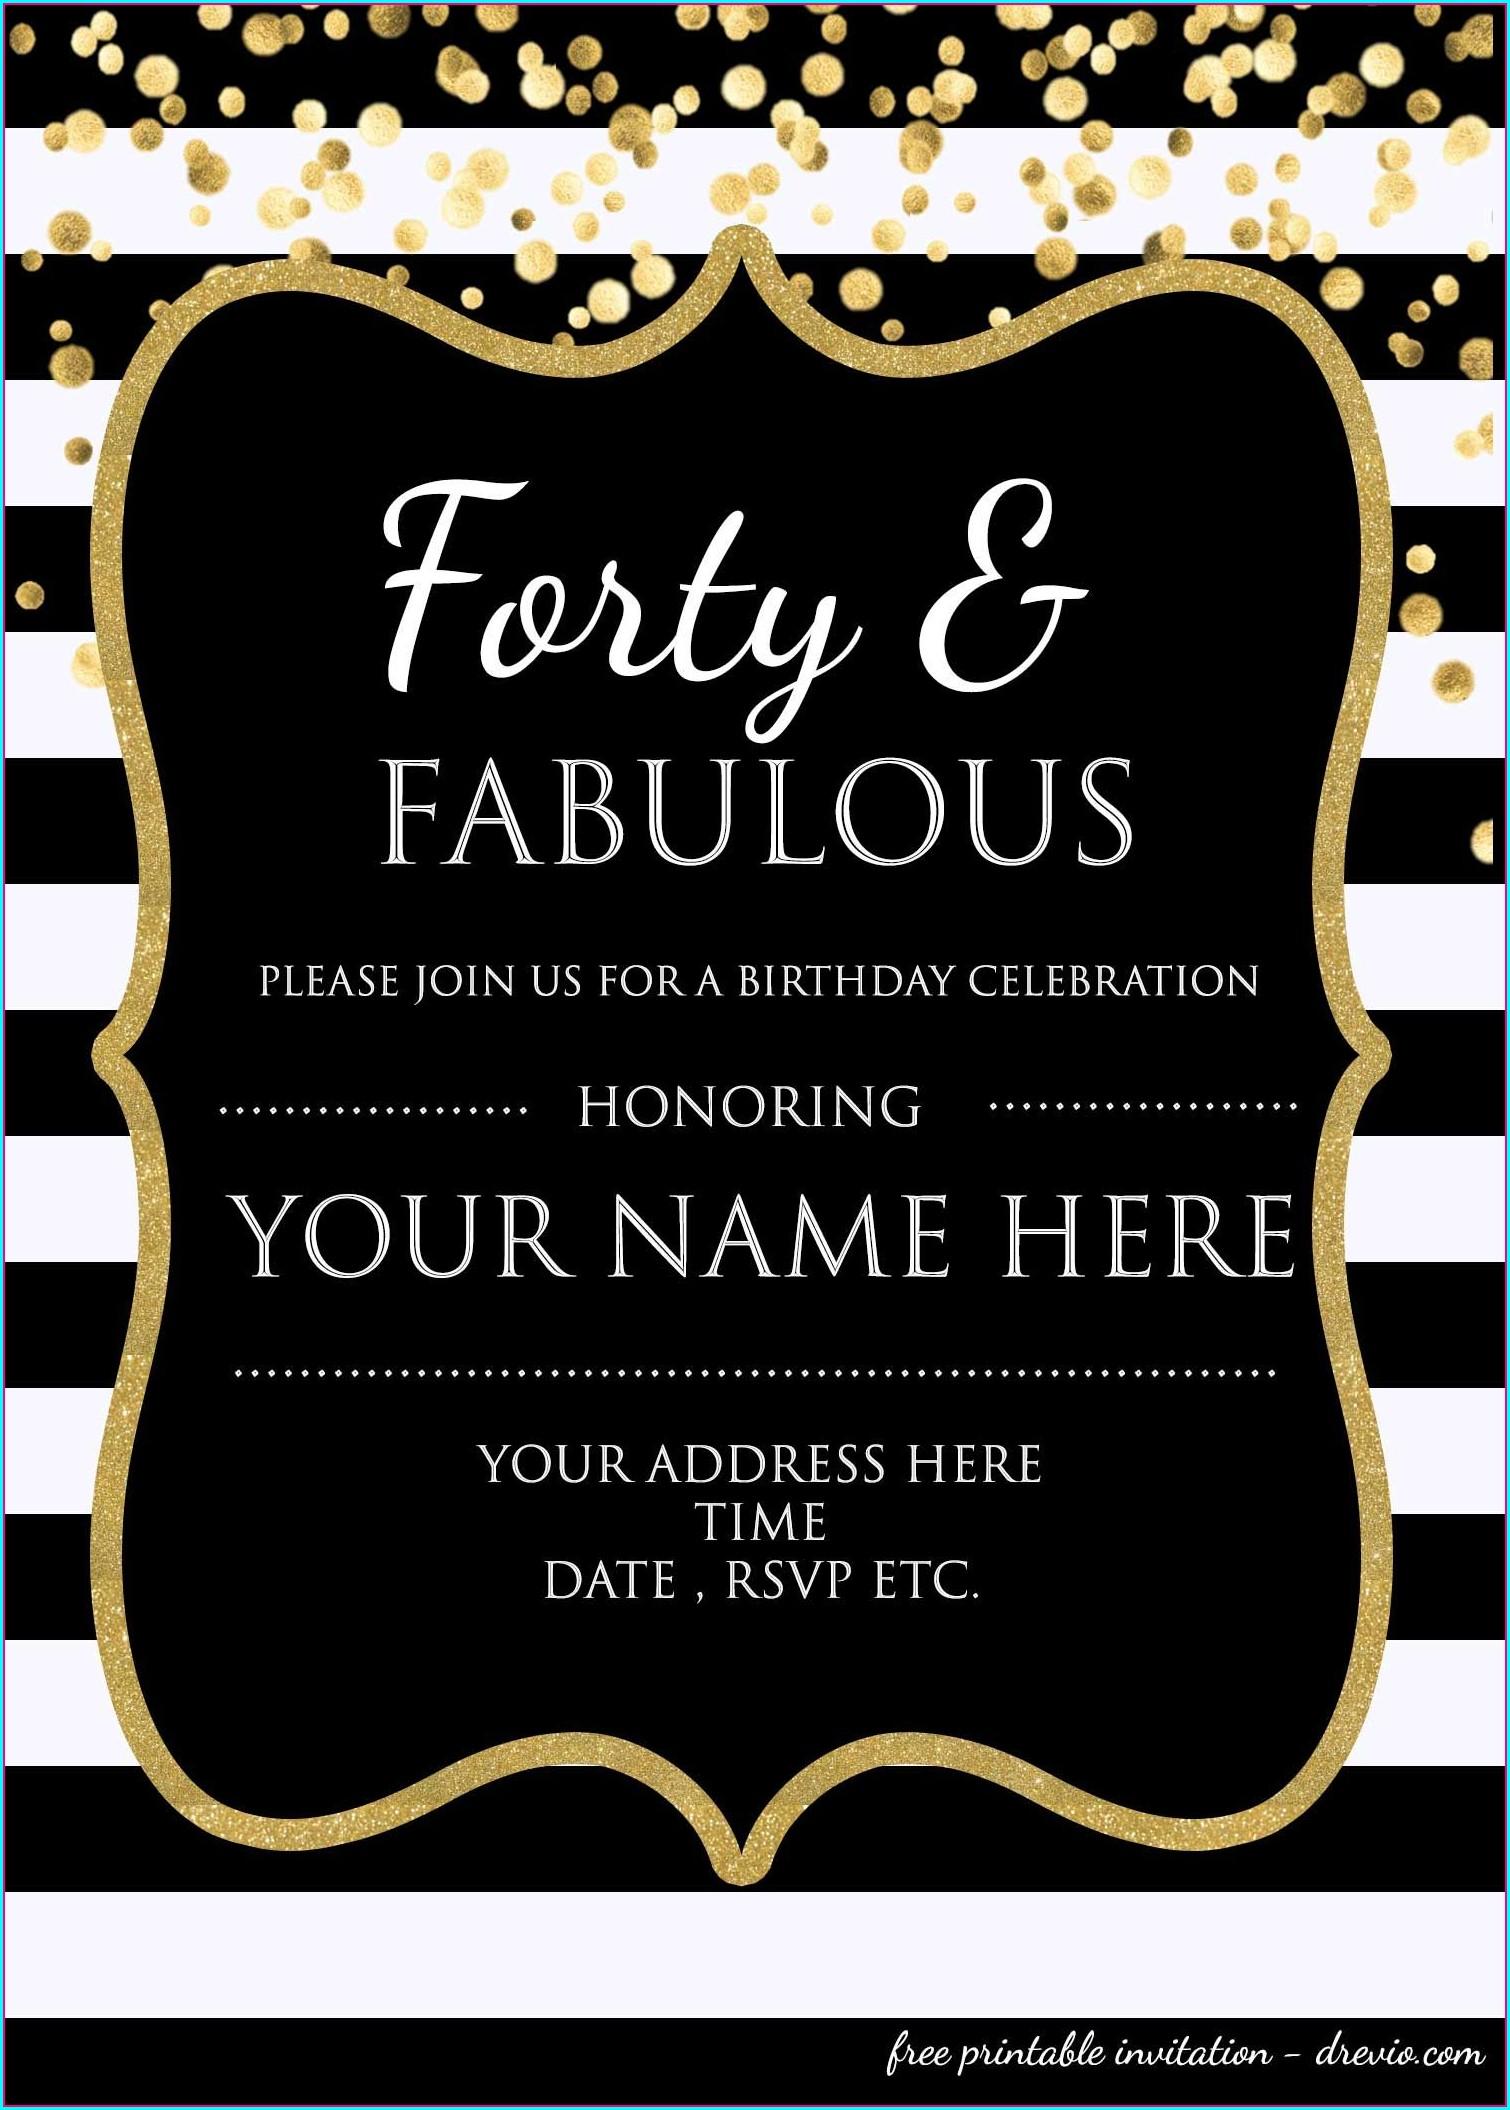 Editable Birthday Invitations Templates Free With Photo